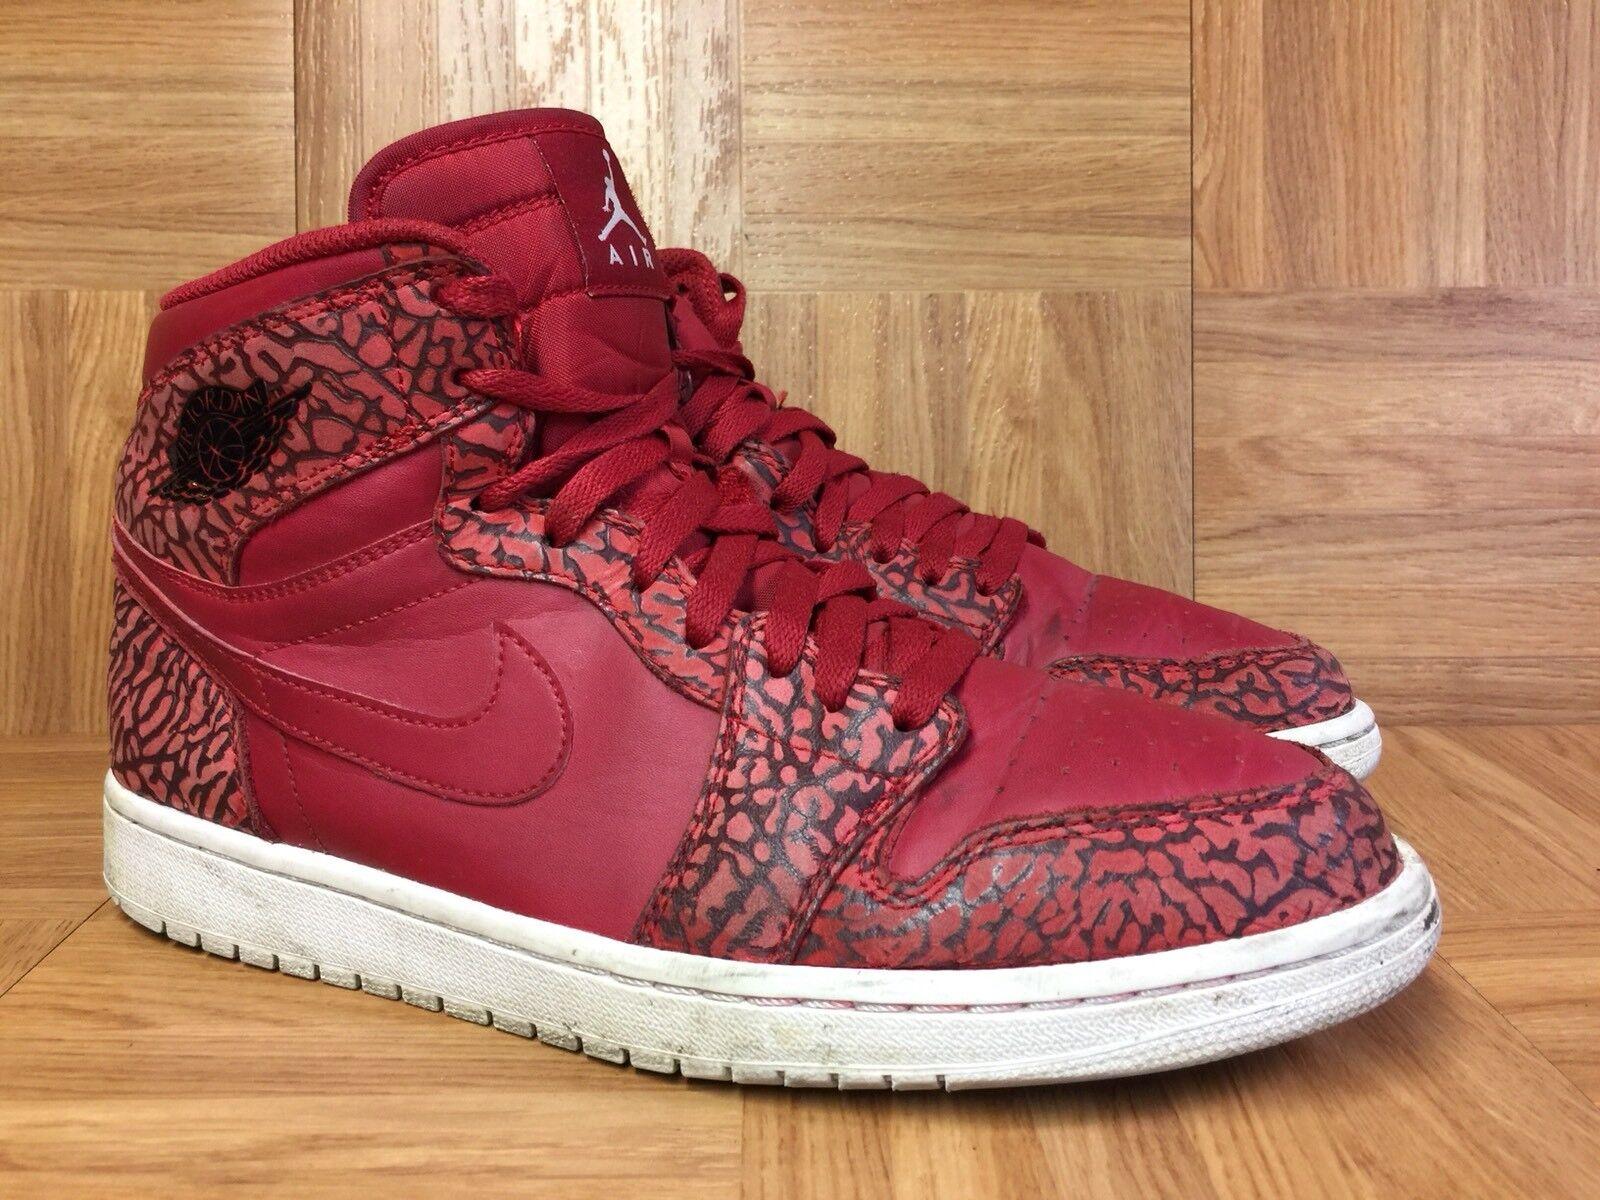 RARE? Nike Air Jordan 1 Retro High Gym Red Elephant Print Sz 10.5 839115-600 LE